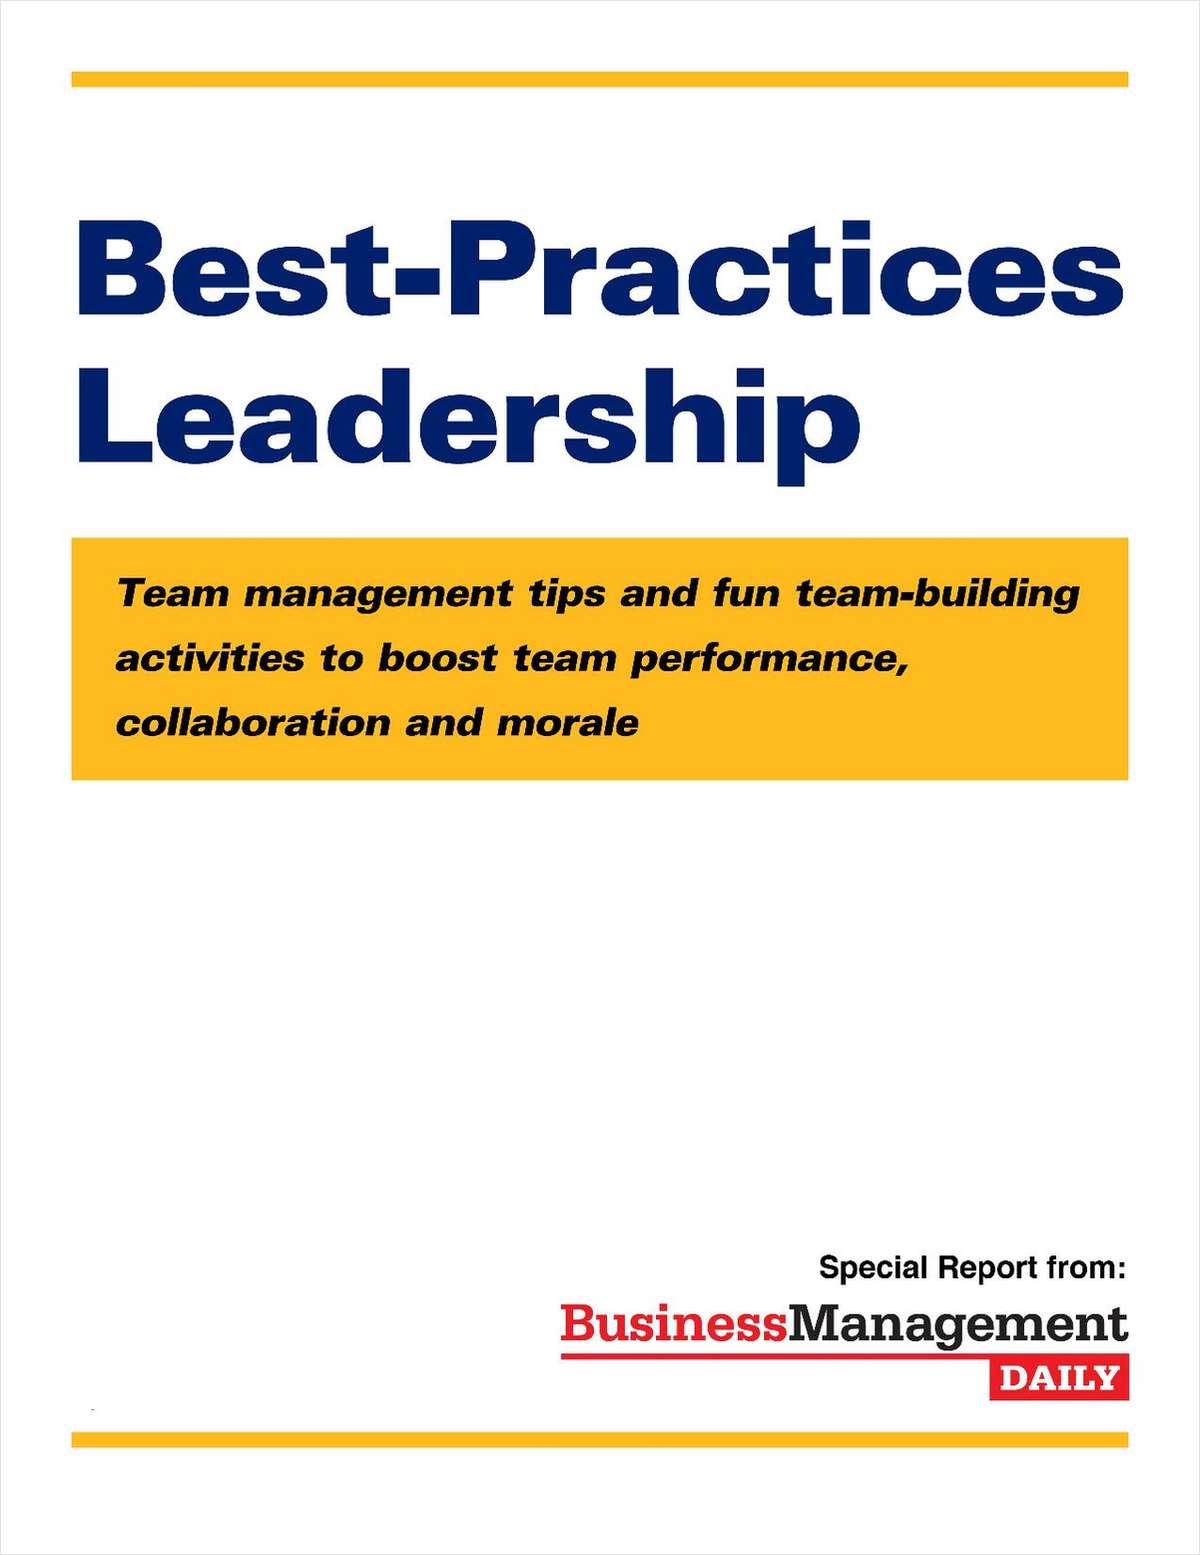 Best-Practices Leadership: Team Management Tips